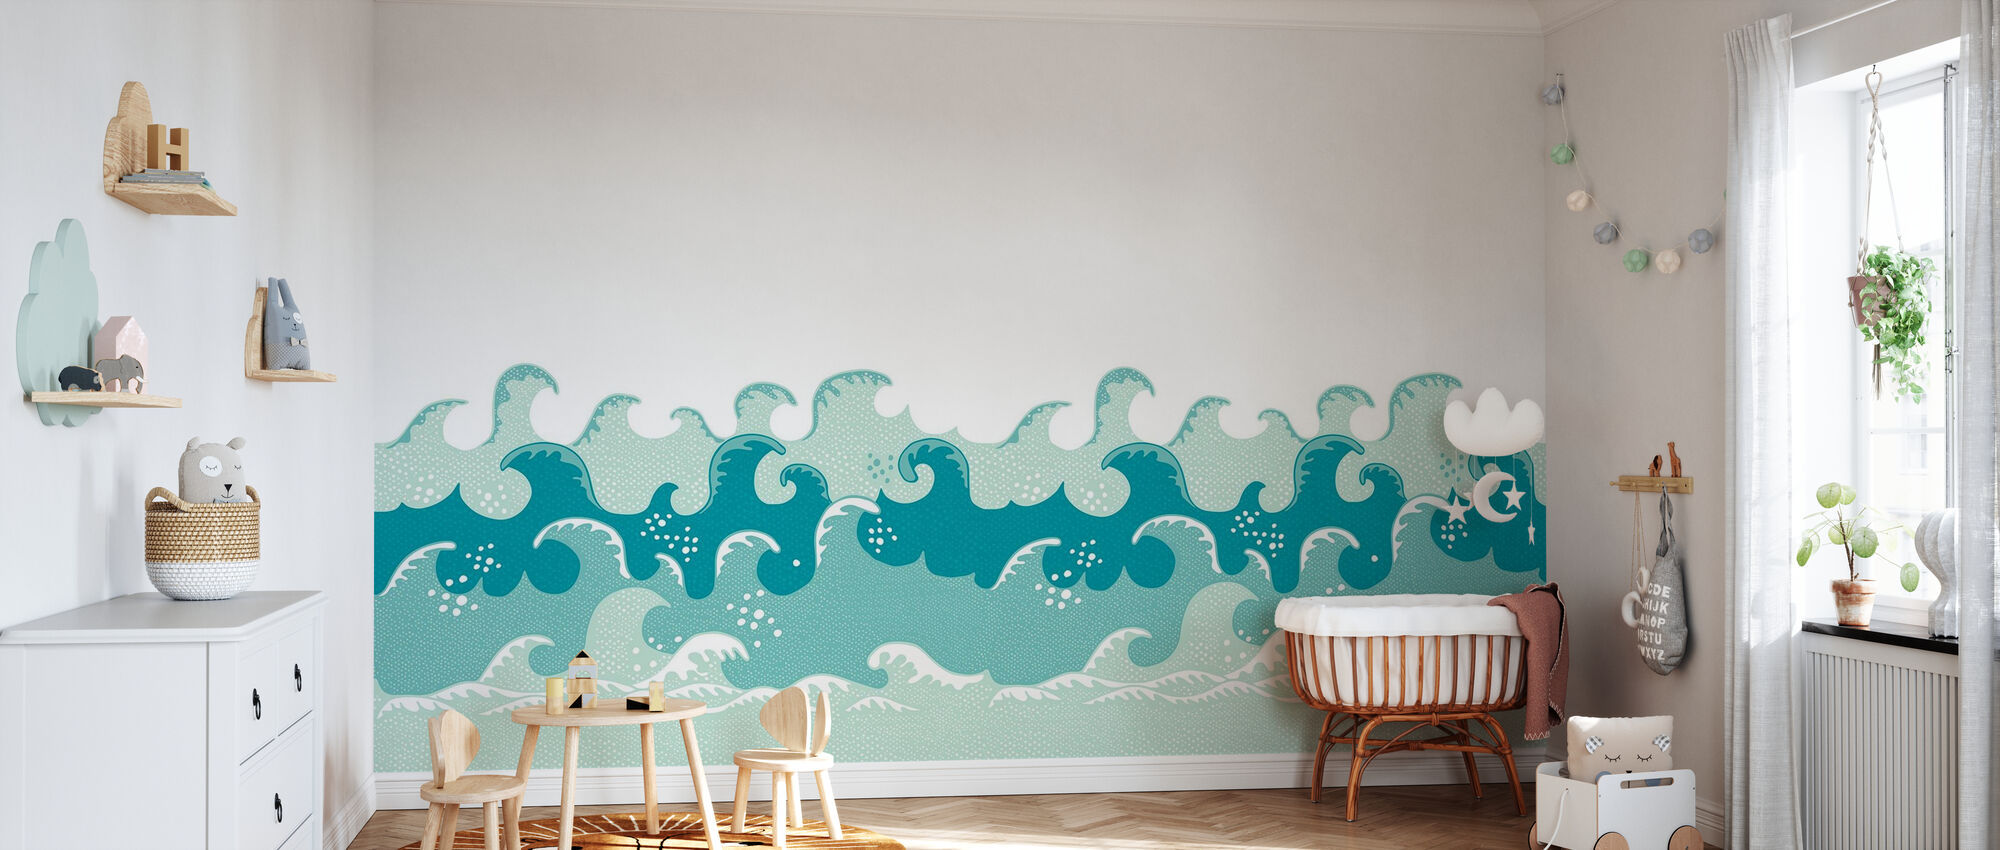 Waves Blur - Wallpaper - Nursery